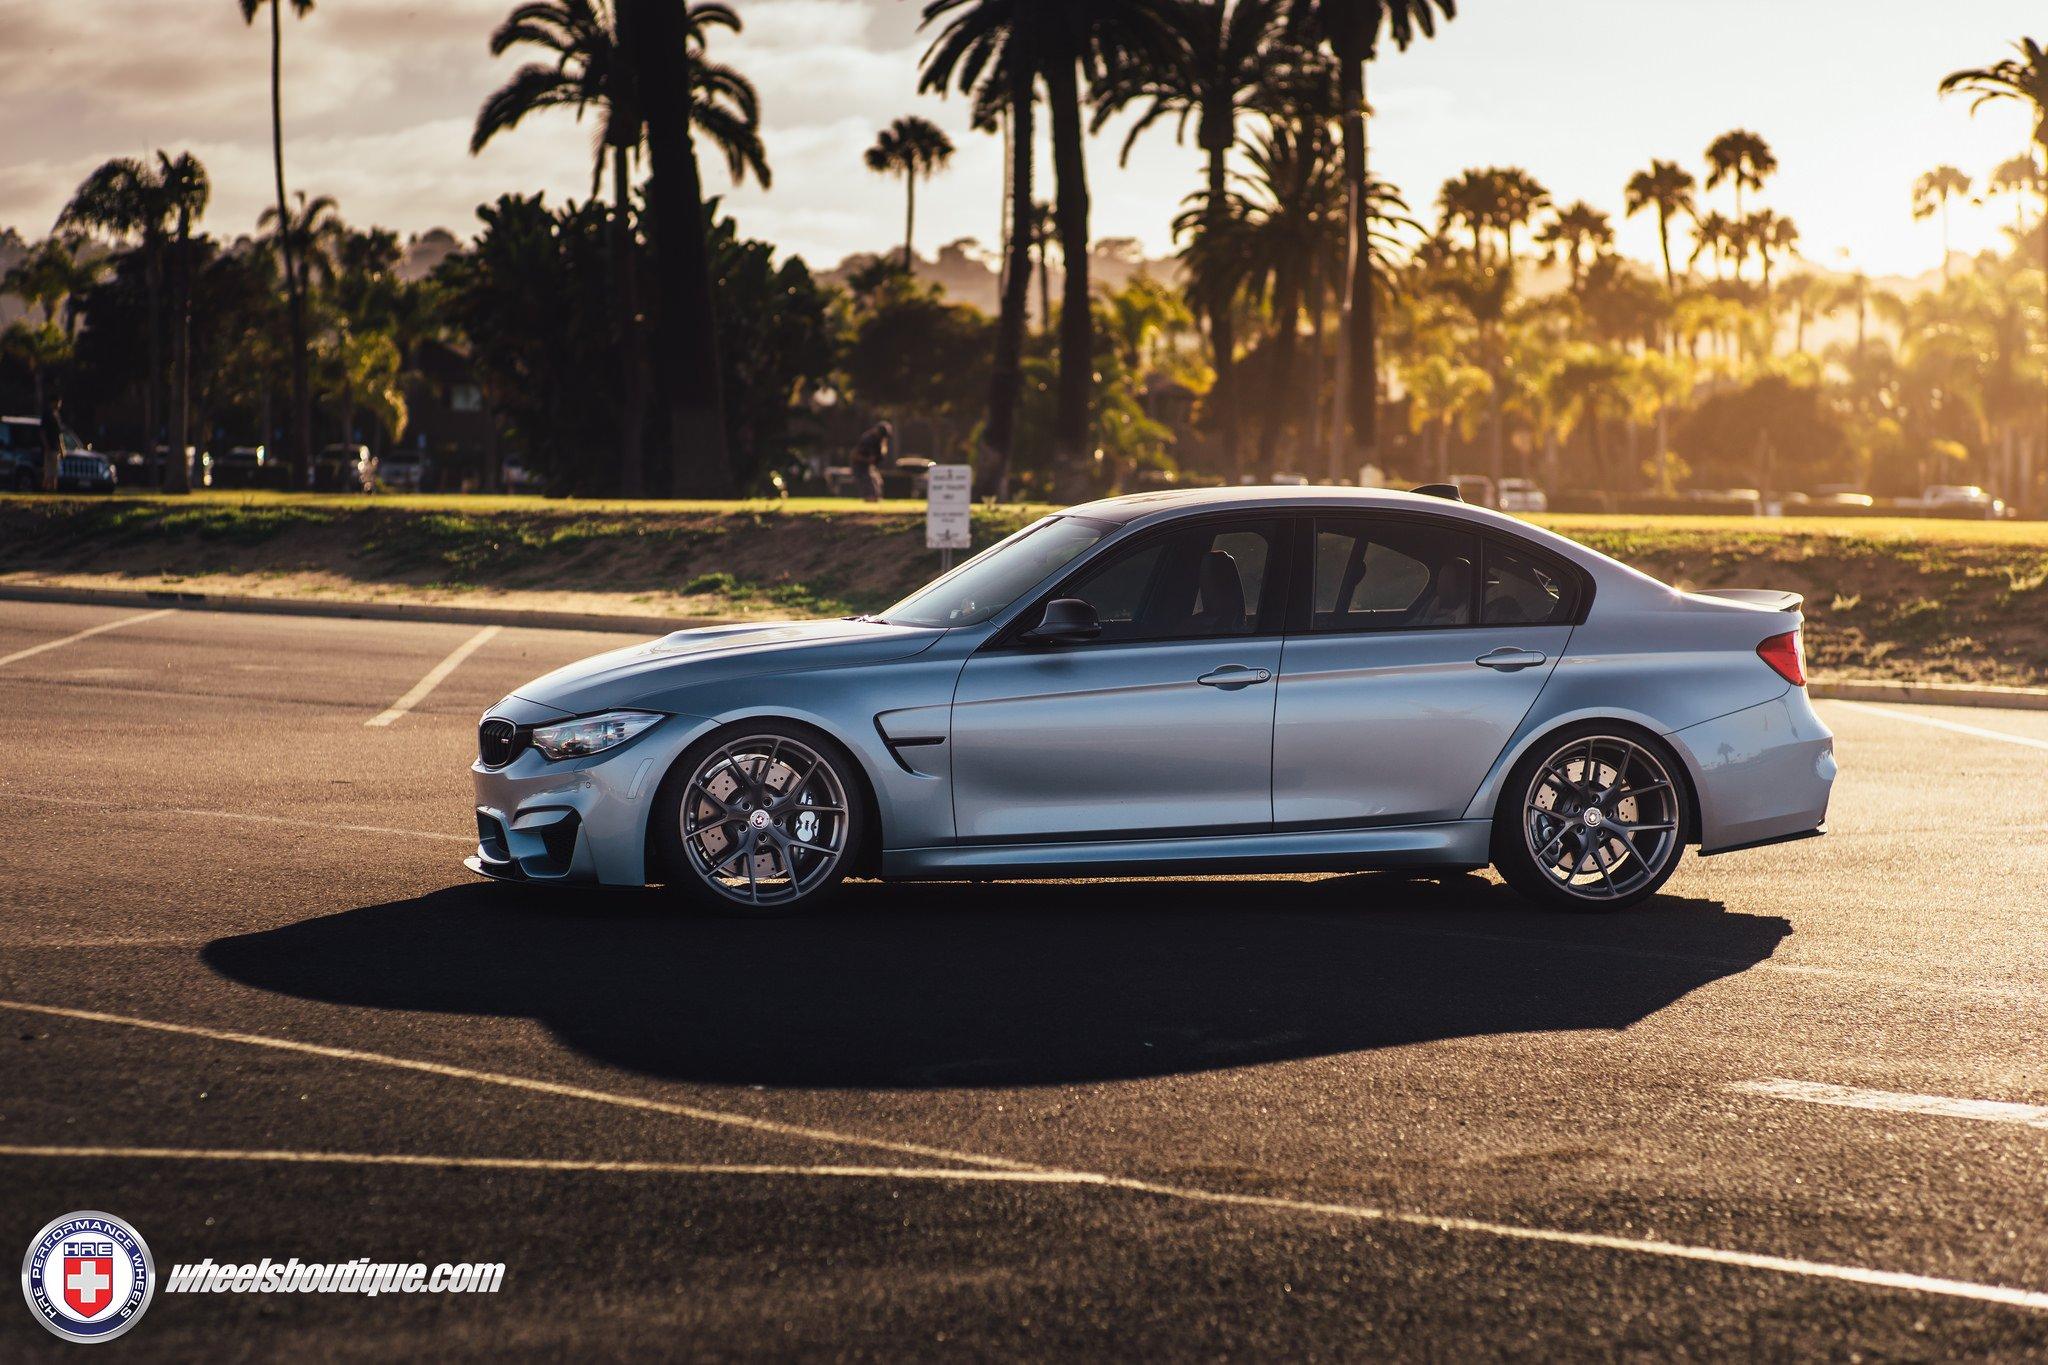 2015 Bmw >> BMW-M3 F80 HRE wheels cars sedan wallpaper | 2048x1365 | 787225 | WallpaperUP